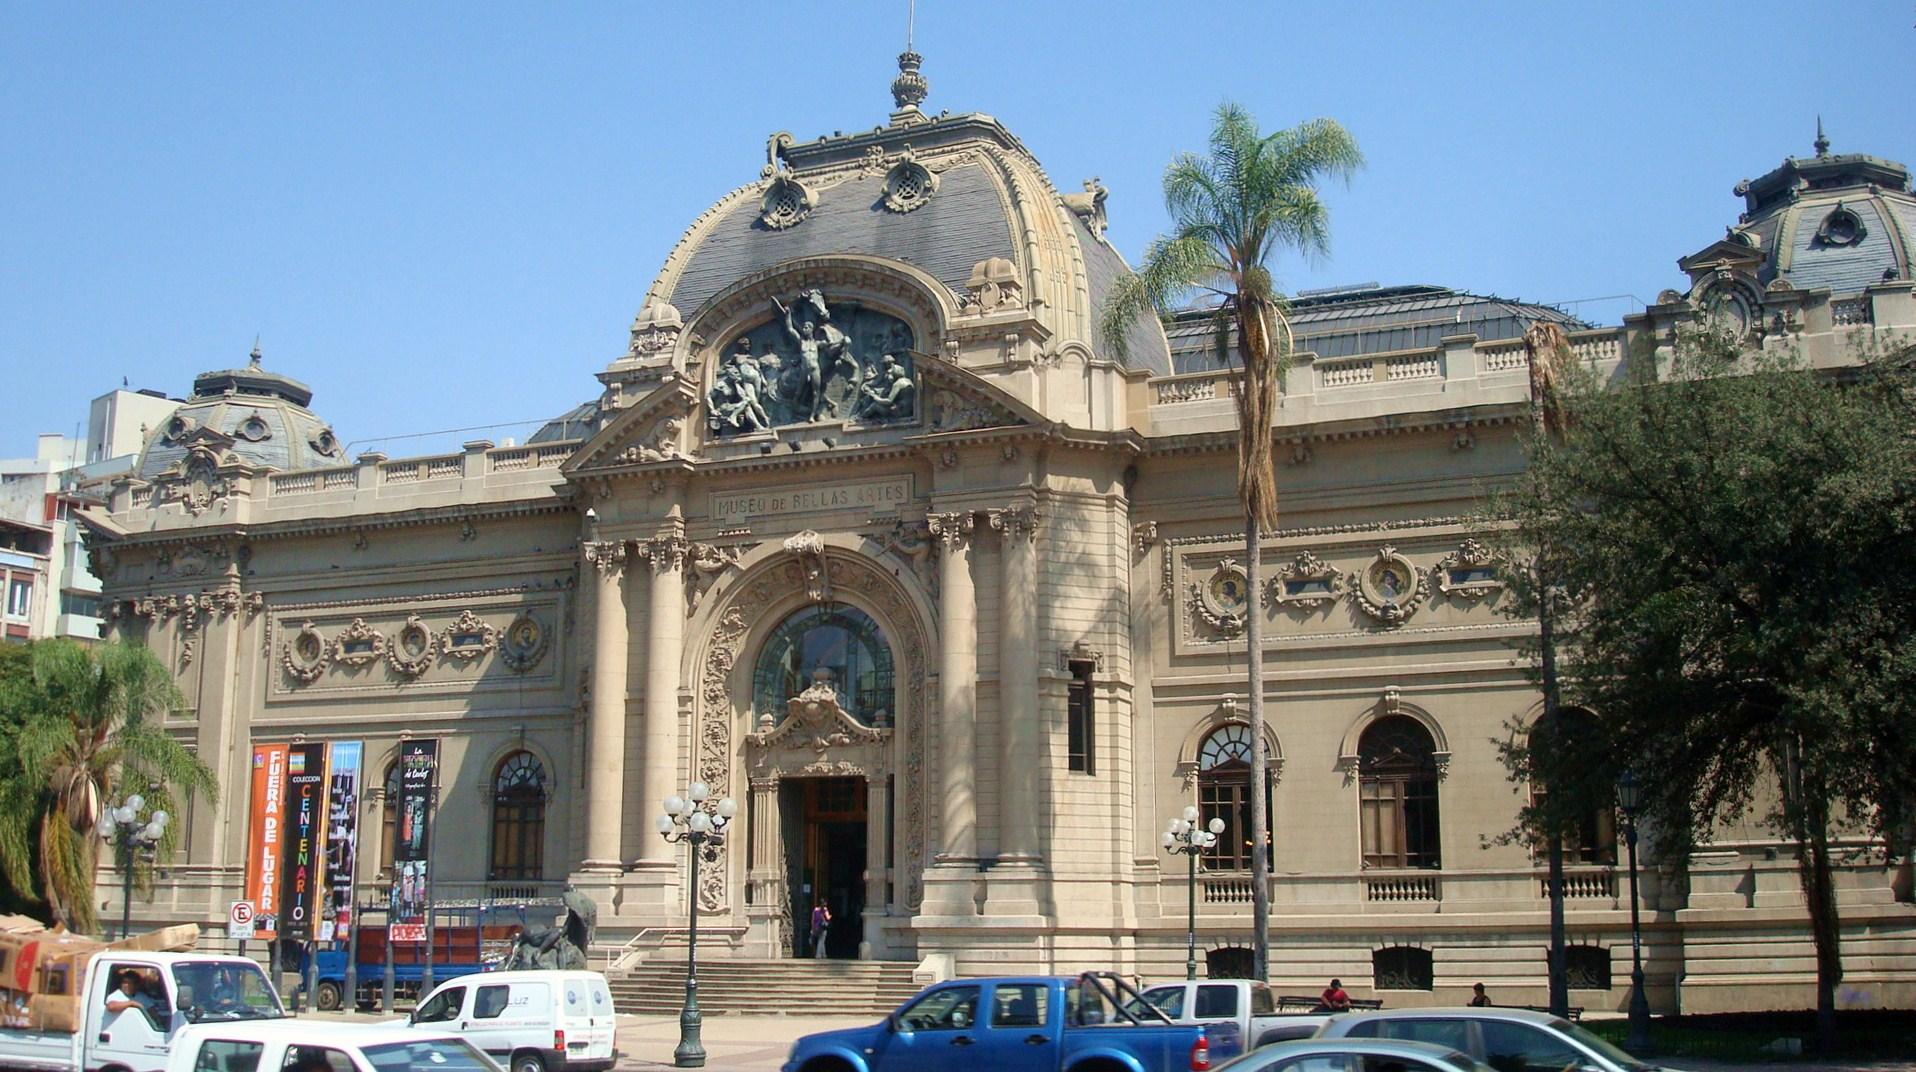 File:Museo Nacional de Bellas Artes 3.jpg - Wikimedia Commons